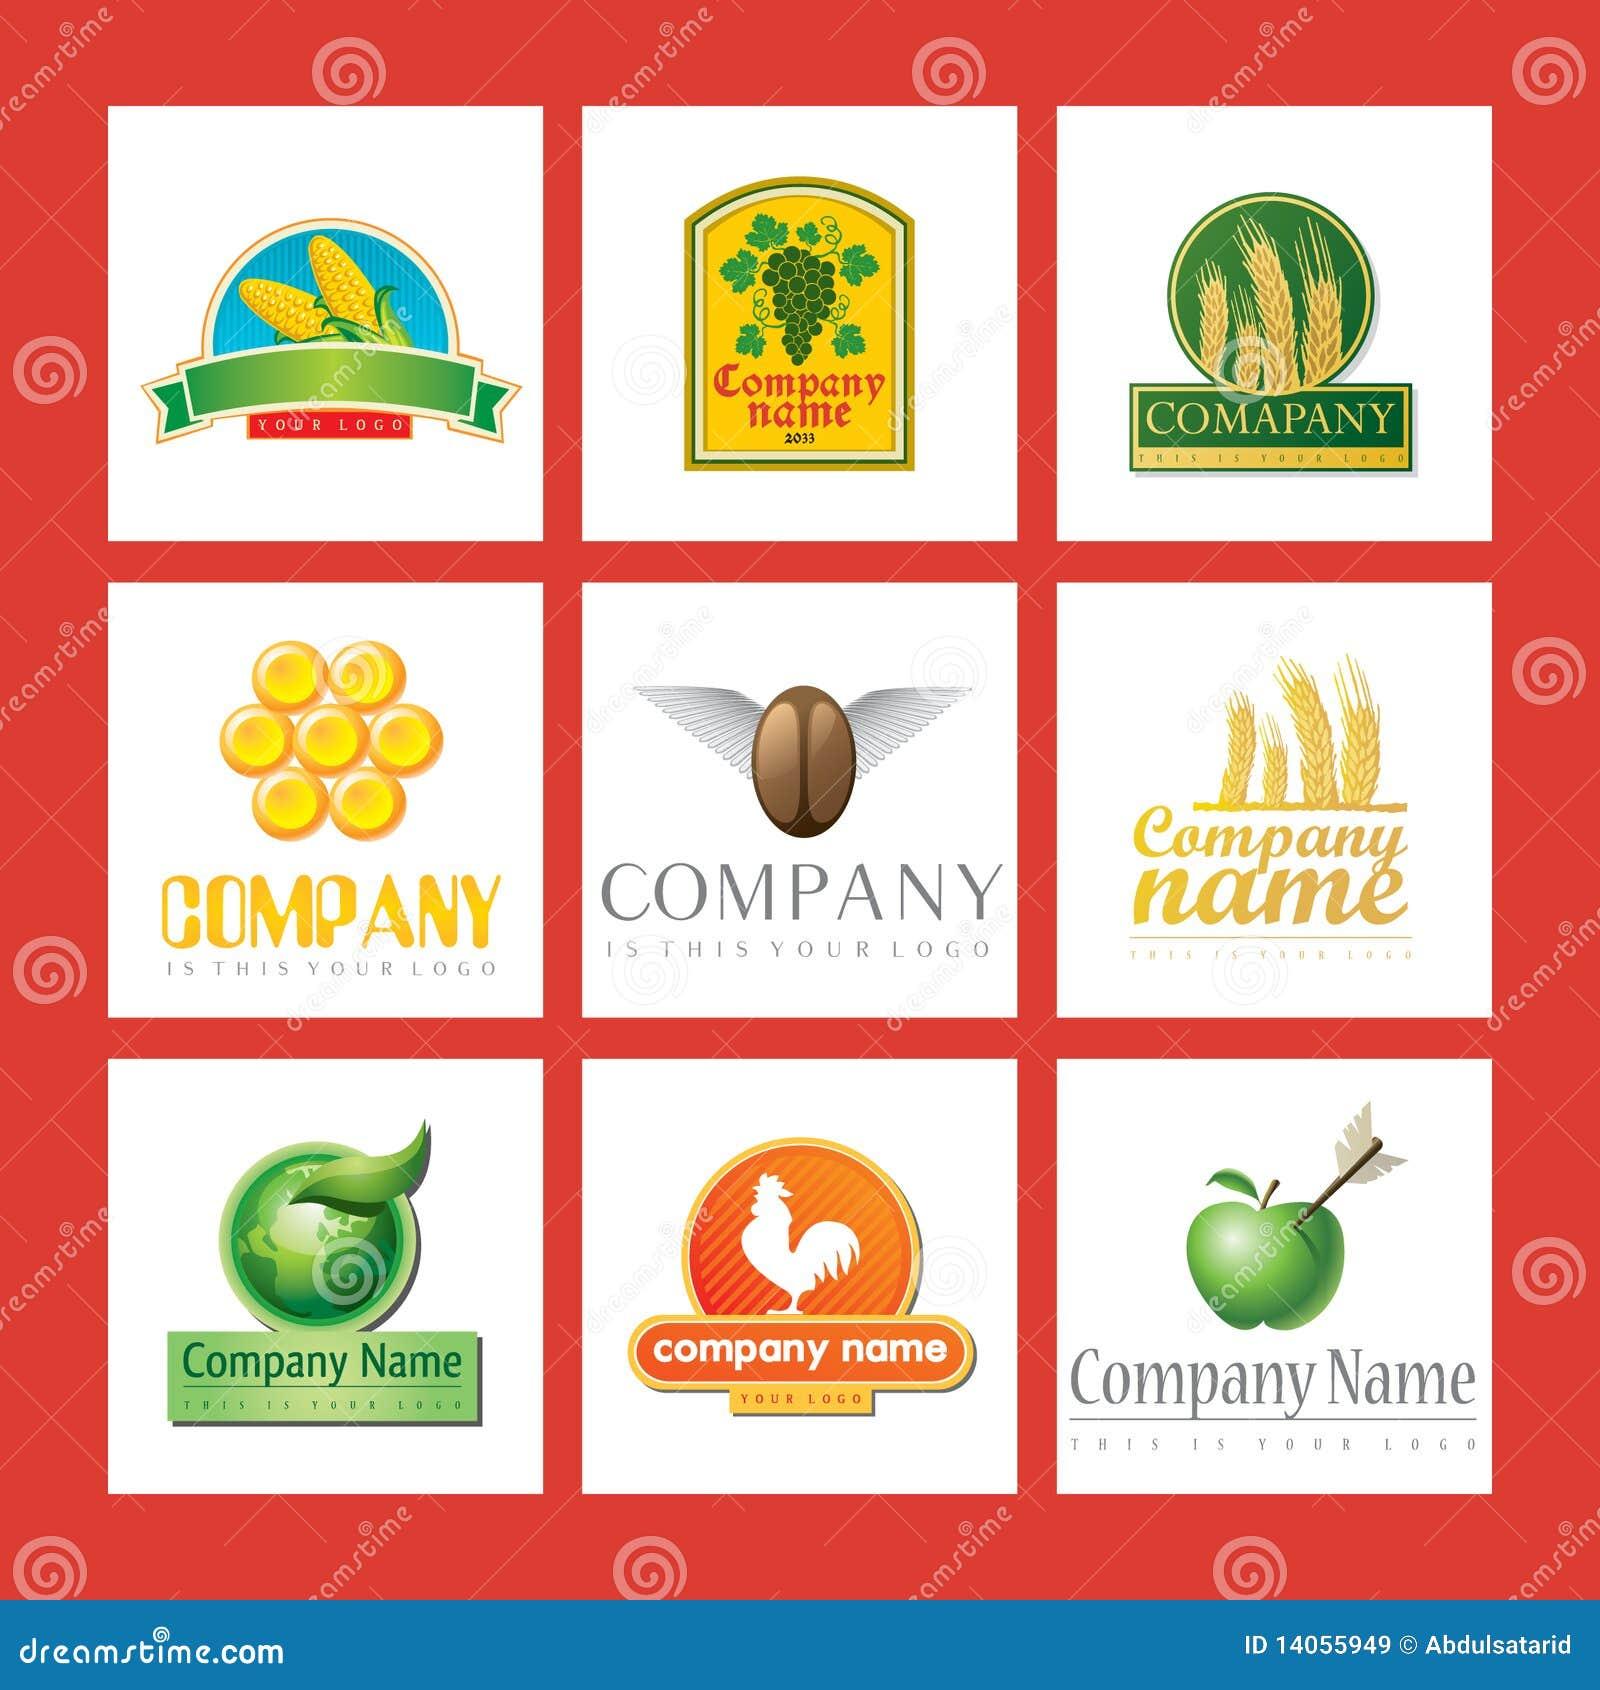 Company logos with food